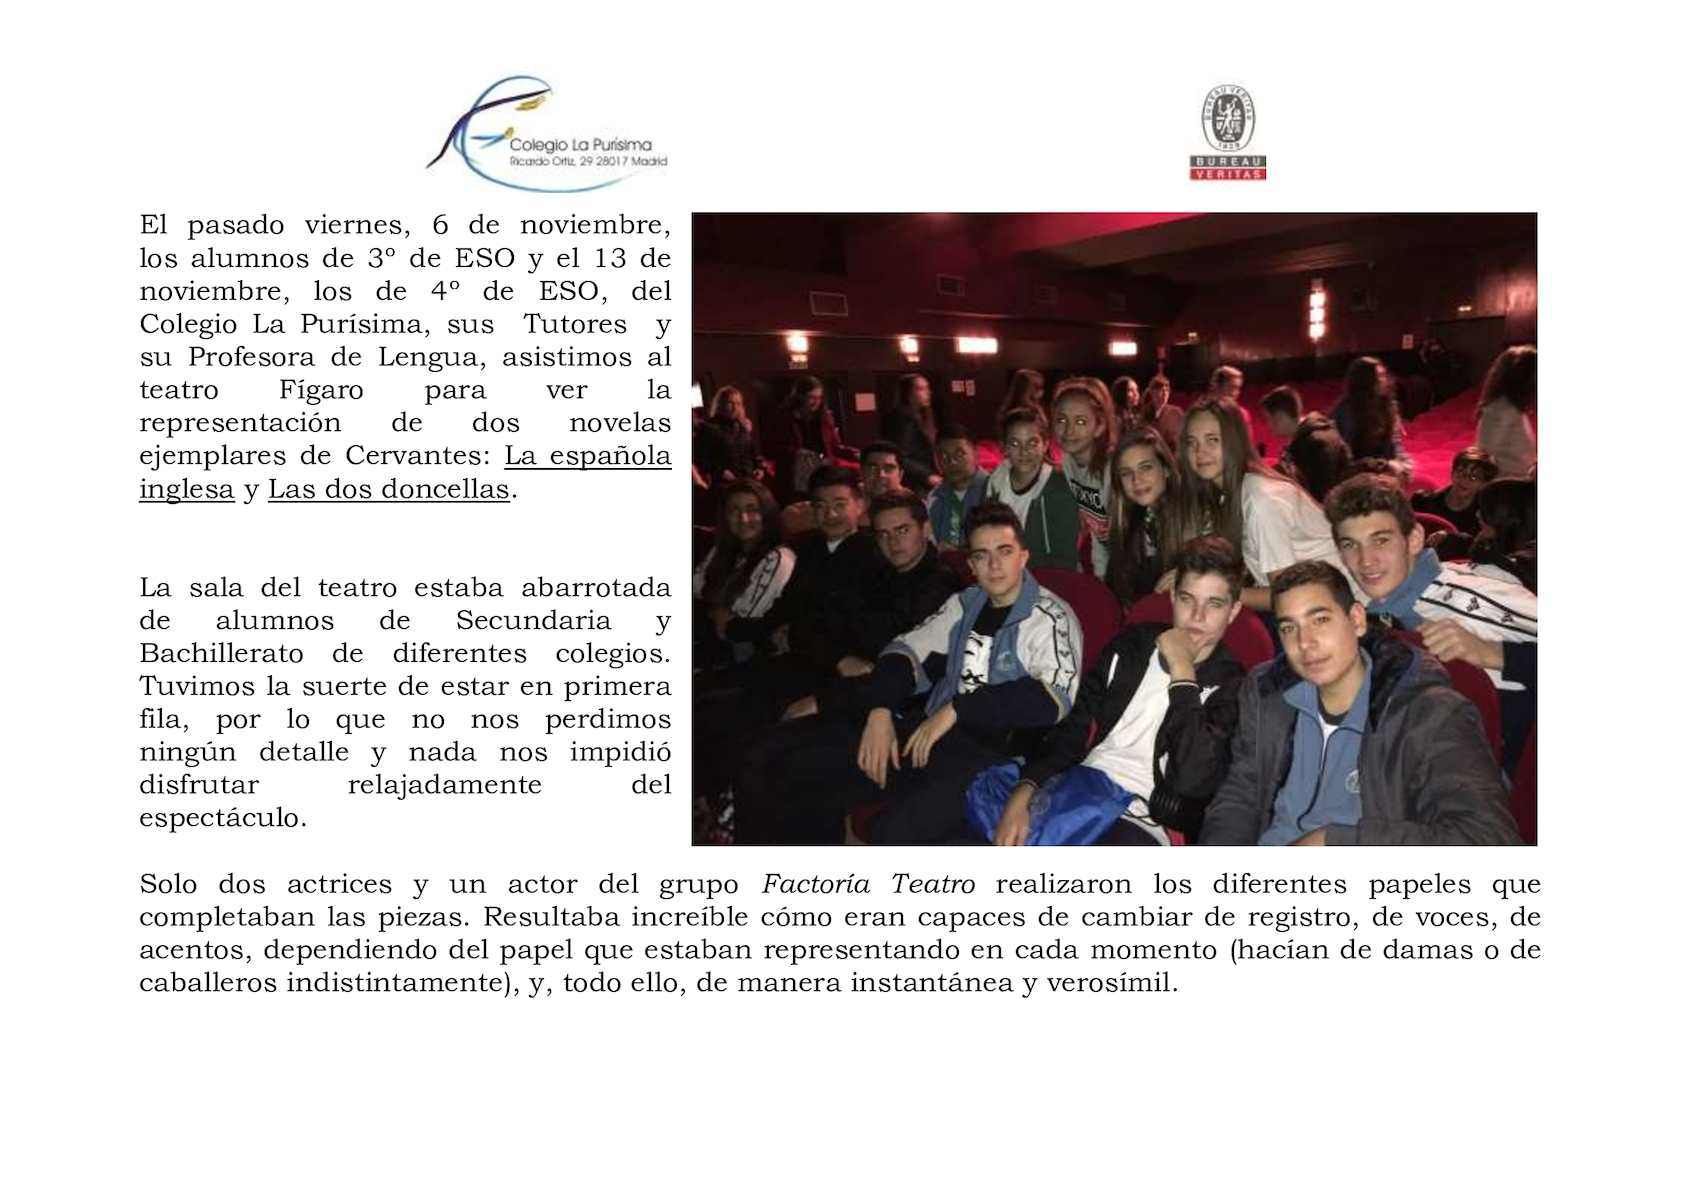 Calaméo - Visita Al Teatro Fígaro